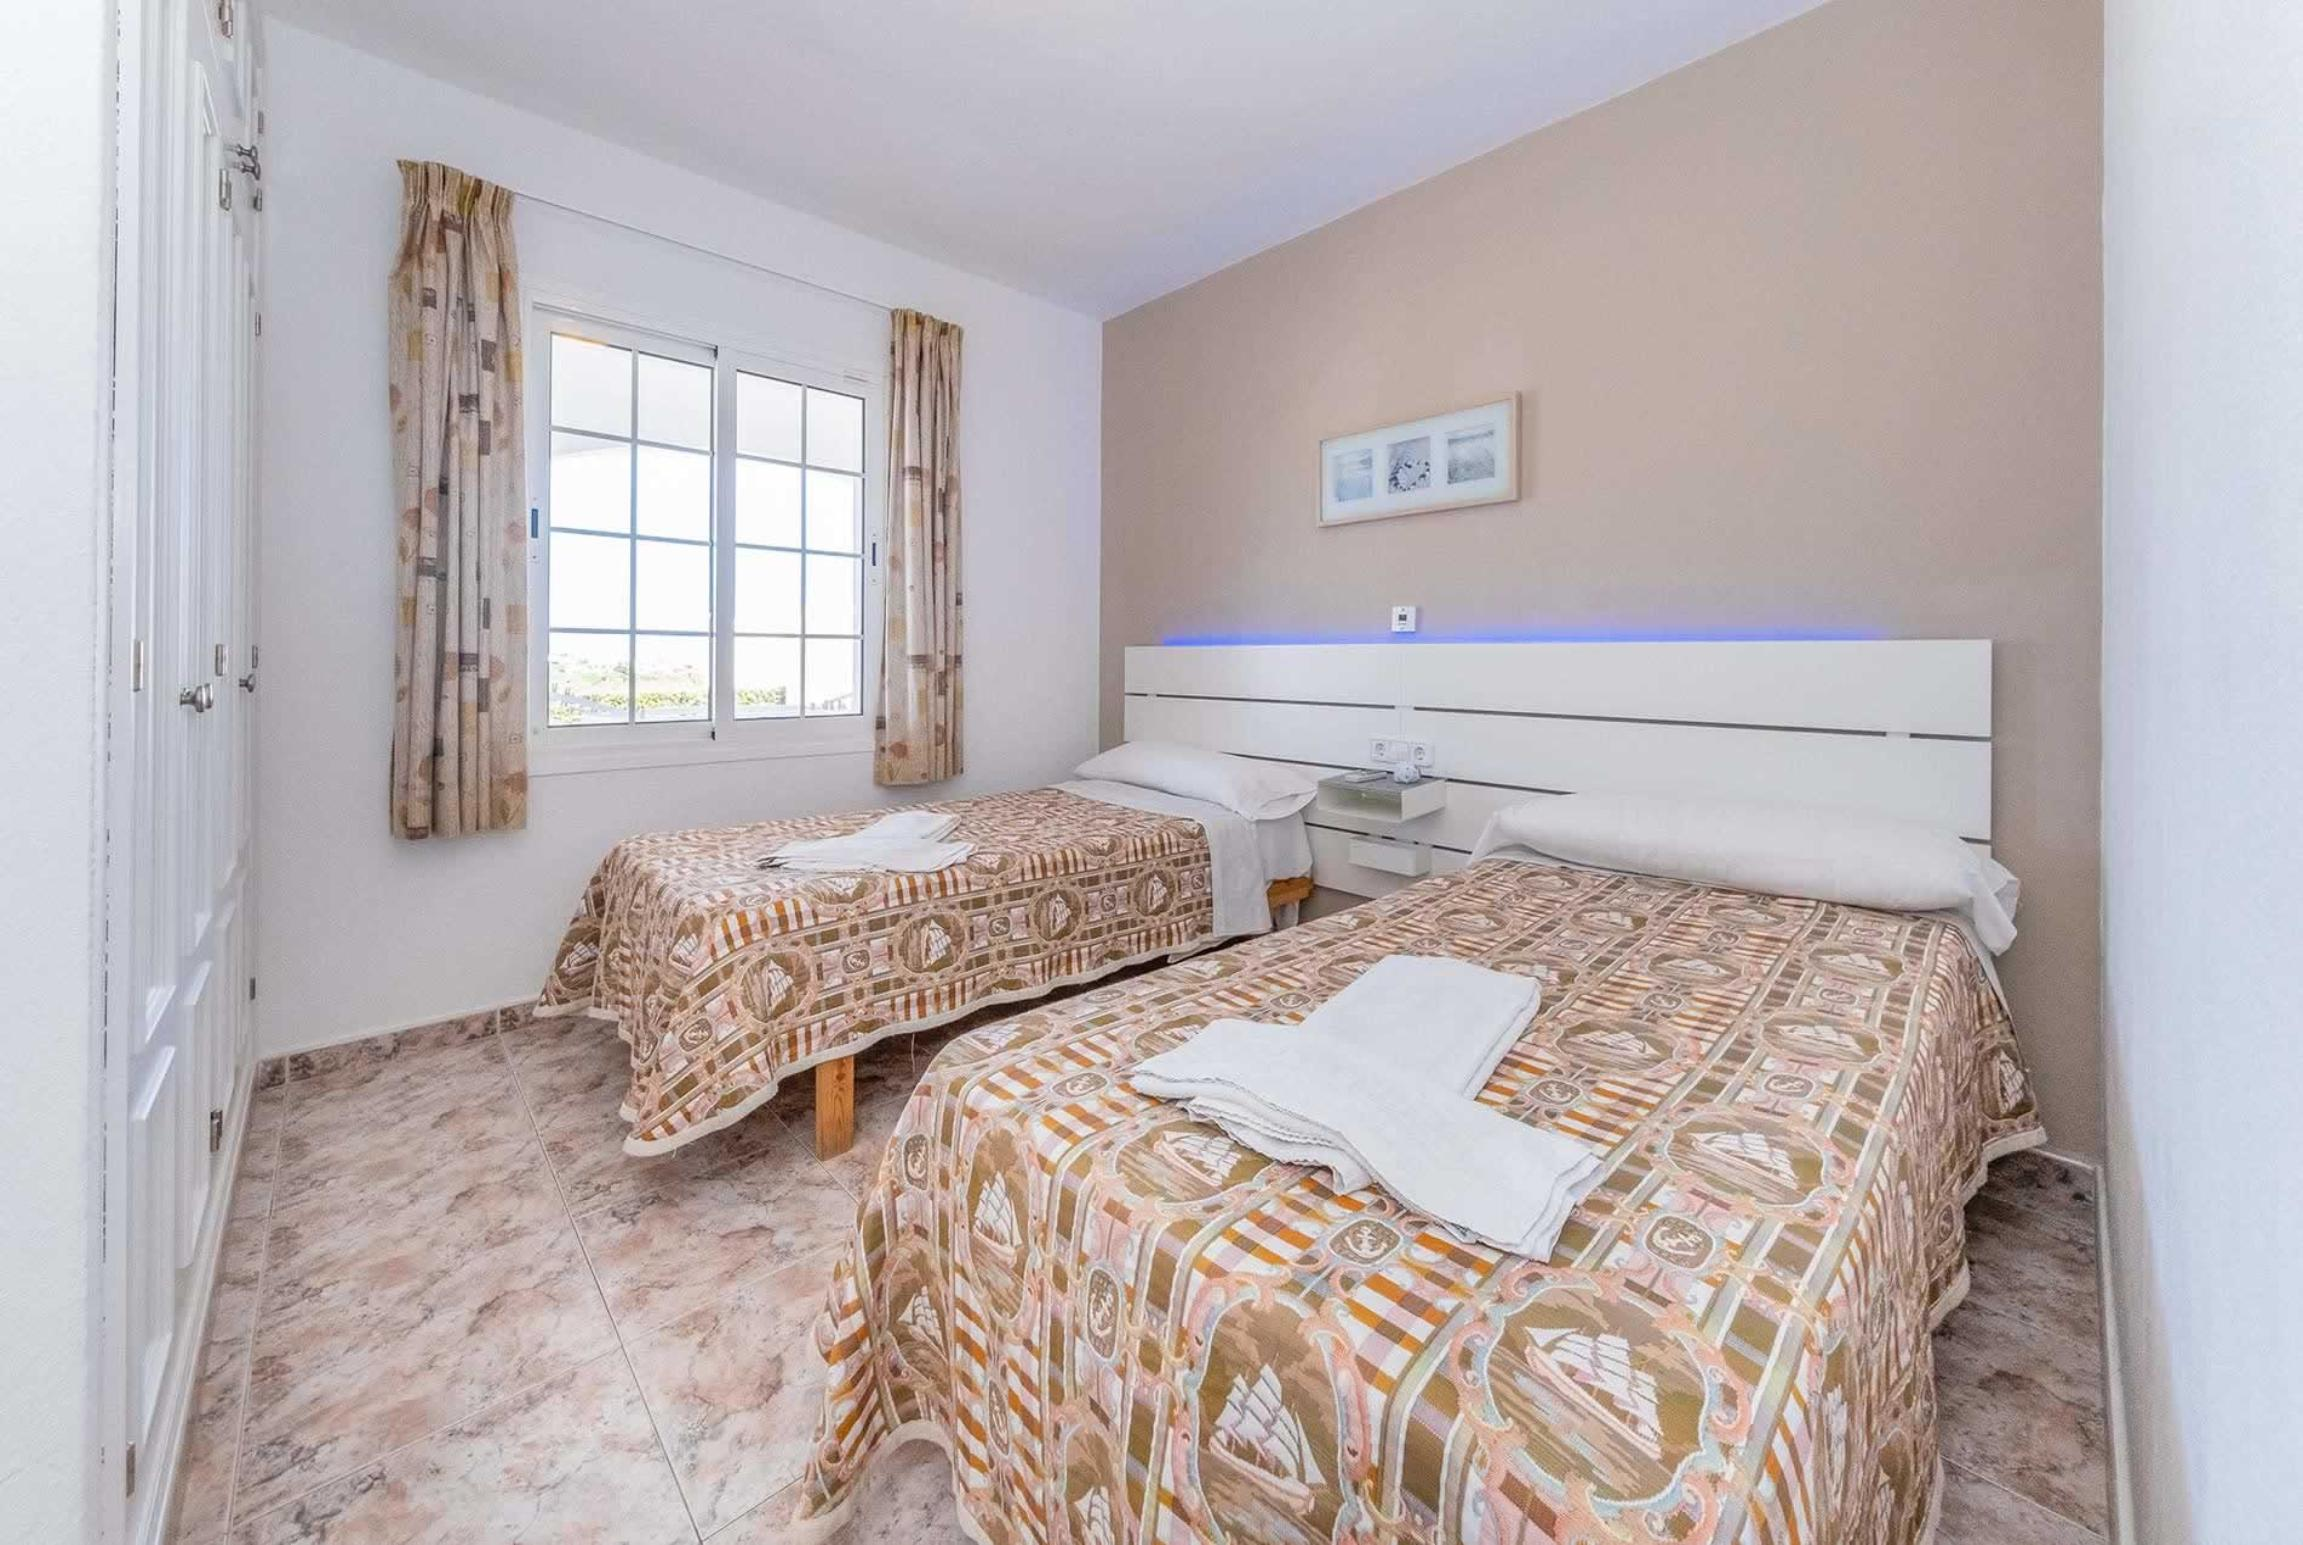 Ferienhaus Bellavista II (2654270), Arenal De'N Castell, Menorca, Balearische Inseln, Spanien, Bild 11